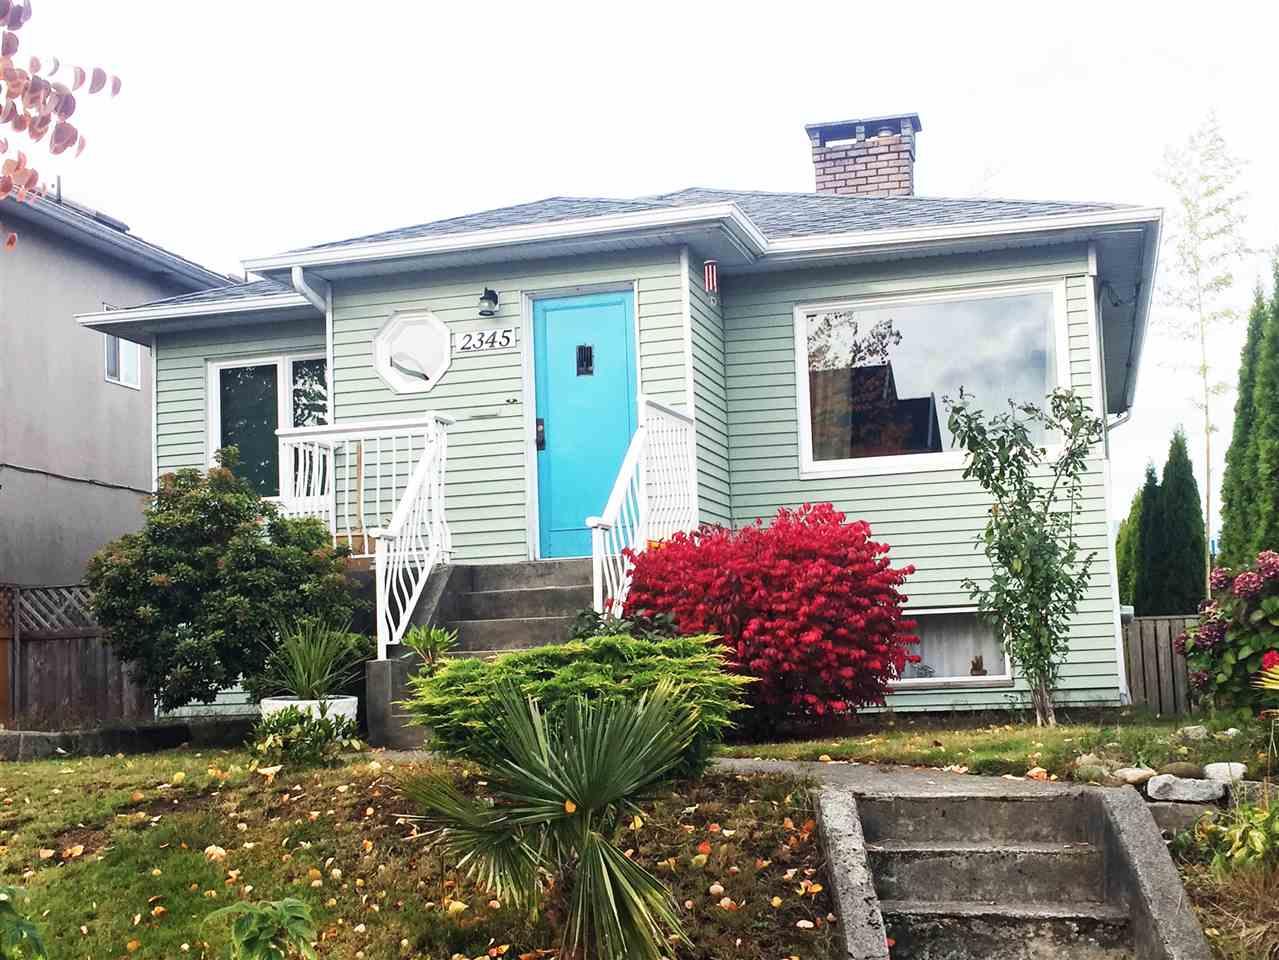 2345 NAPIER STREET, Vancouver, BC, V5L 2P4 Photo 1